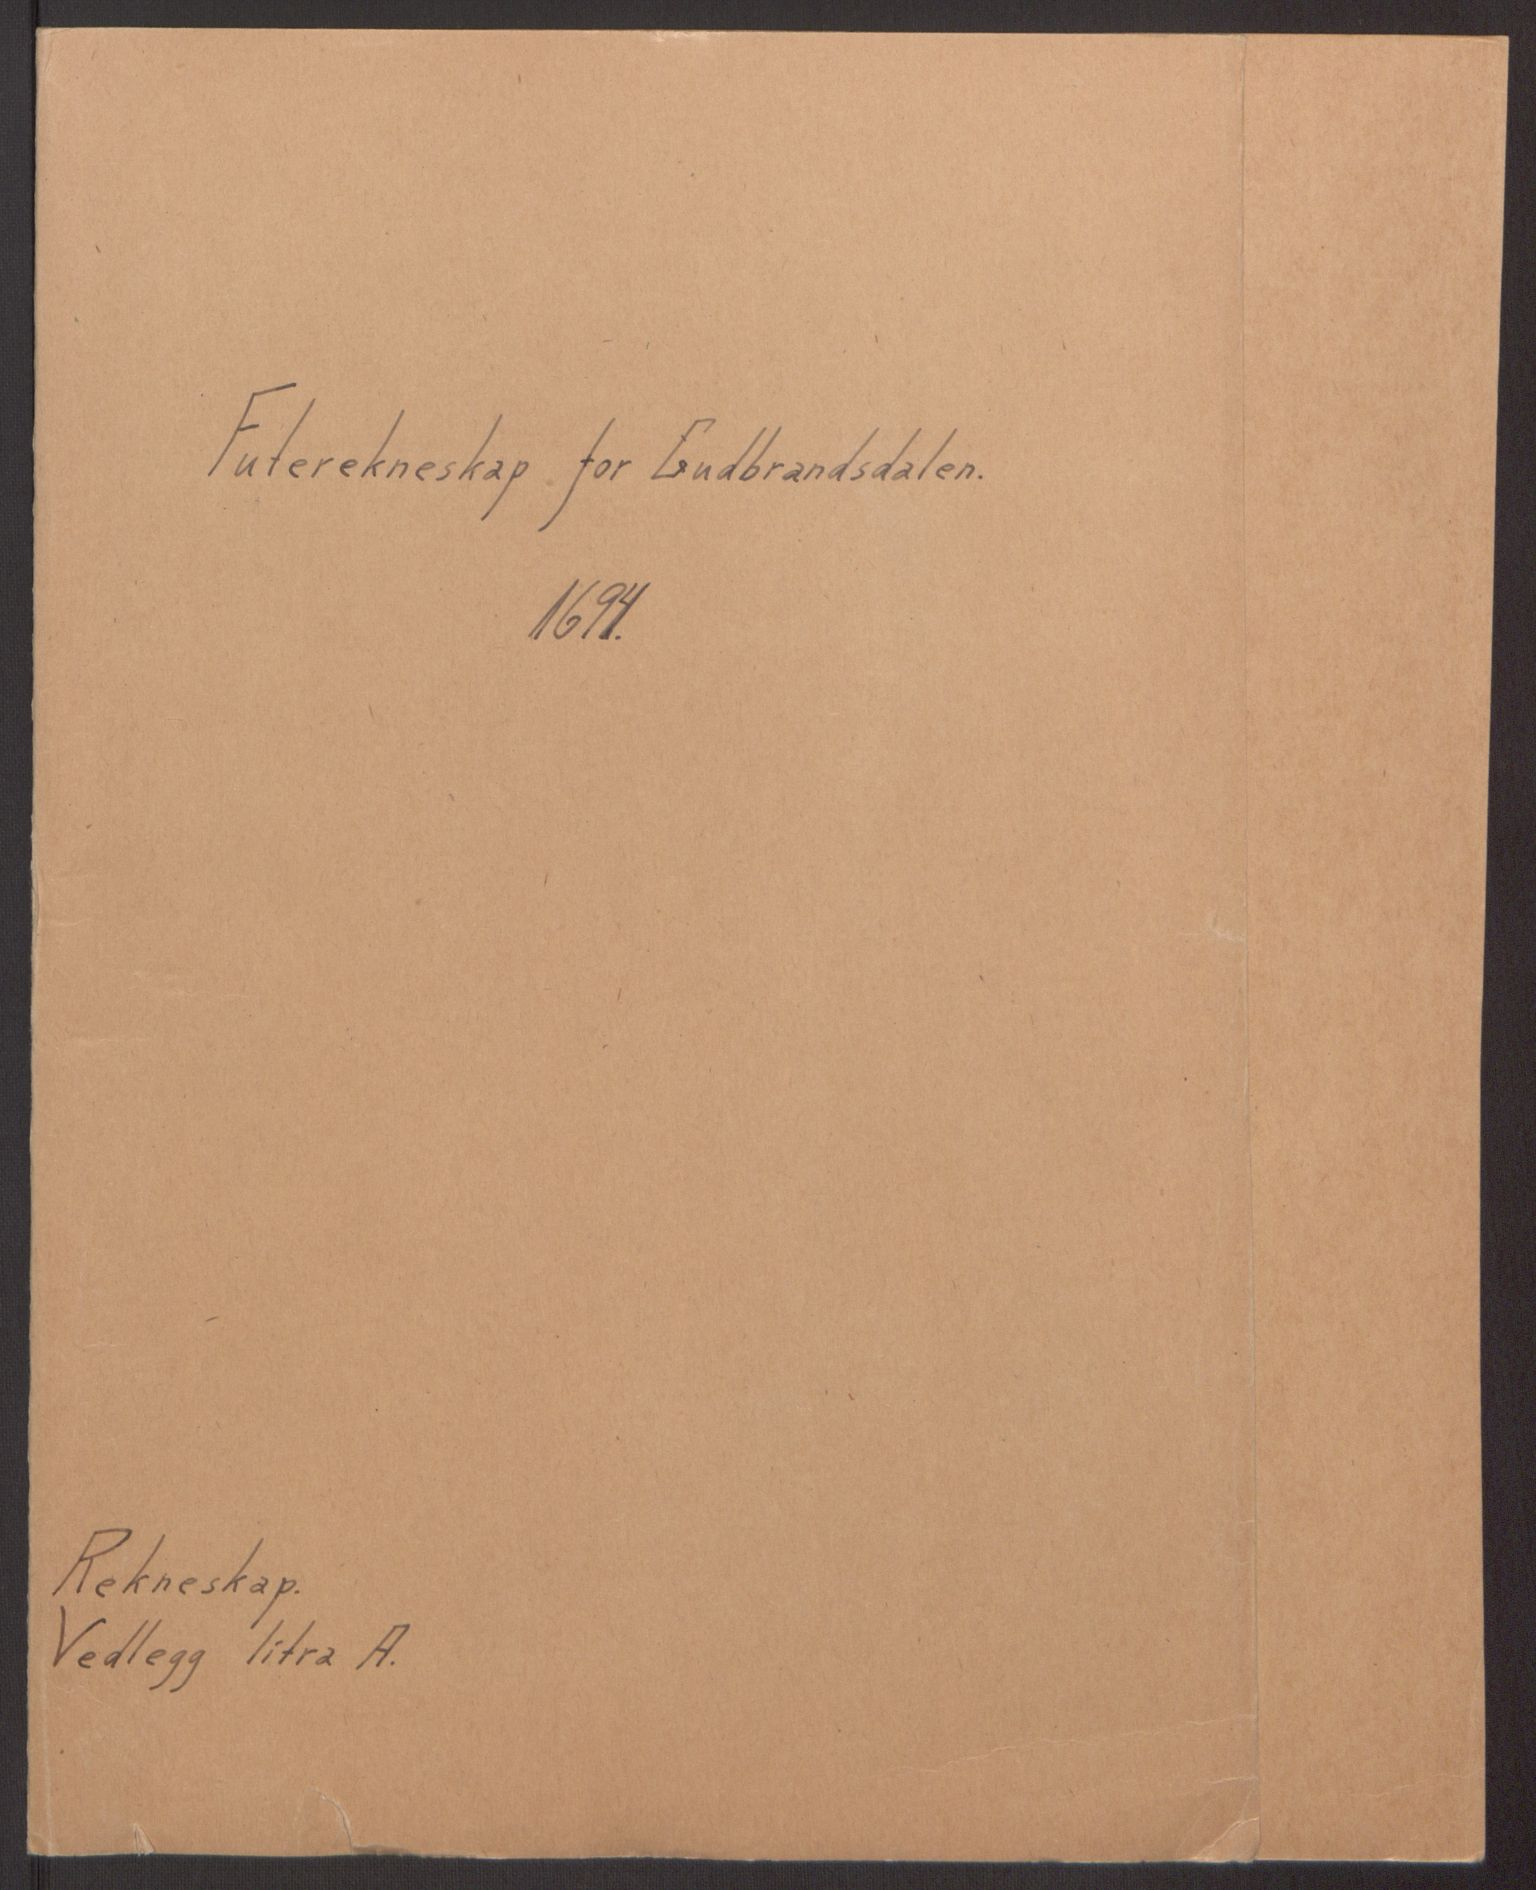 RA, Rentekammeret inntil 1814, Reviderte regnskaper, Fogderegnskap, R17/L1168: Fogderegnskap Gudbrandsdal, 1694, s. 2